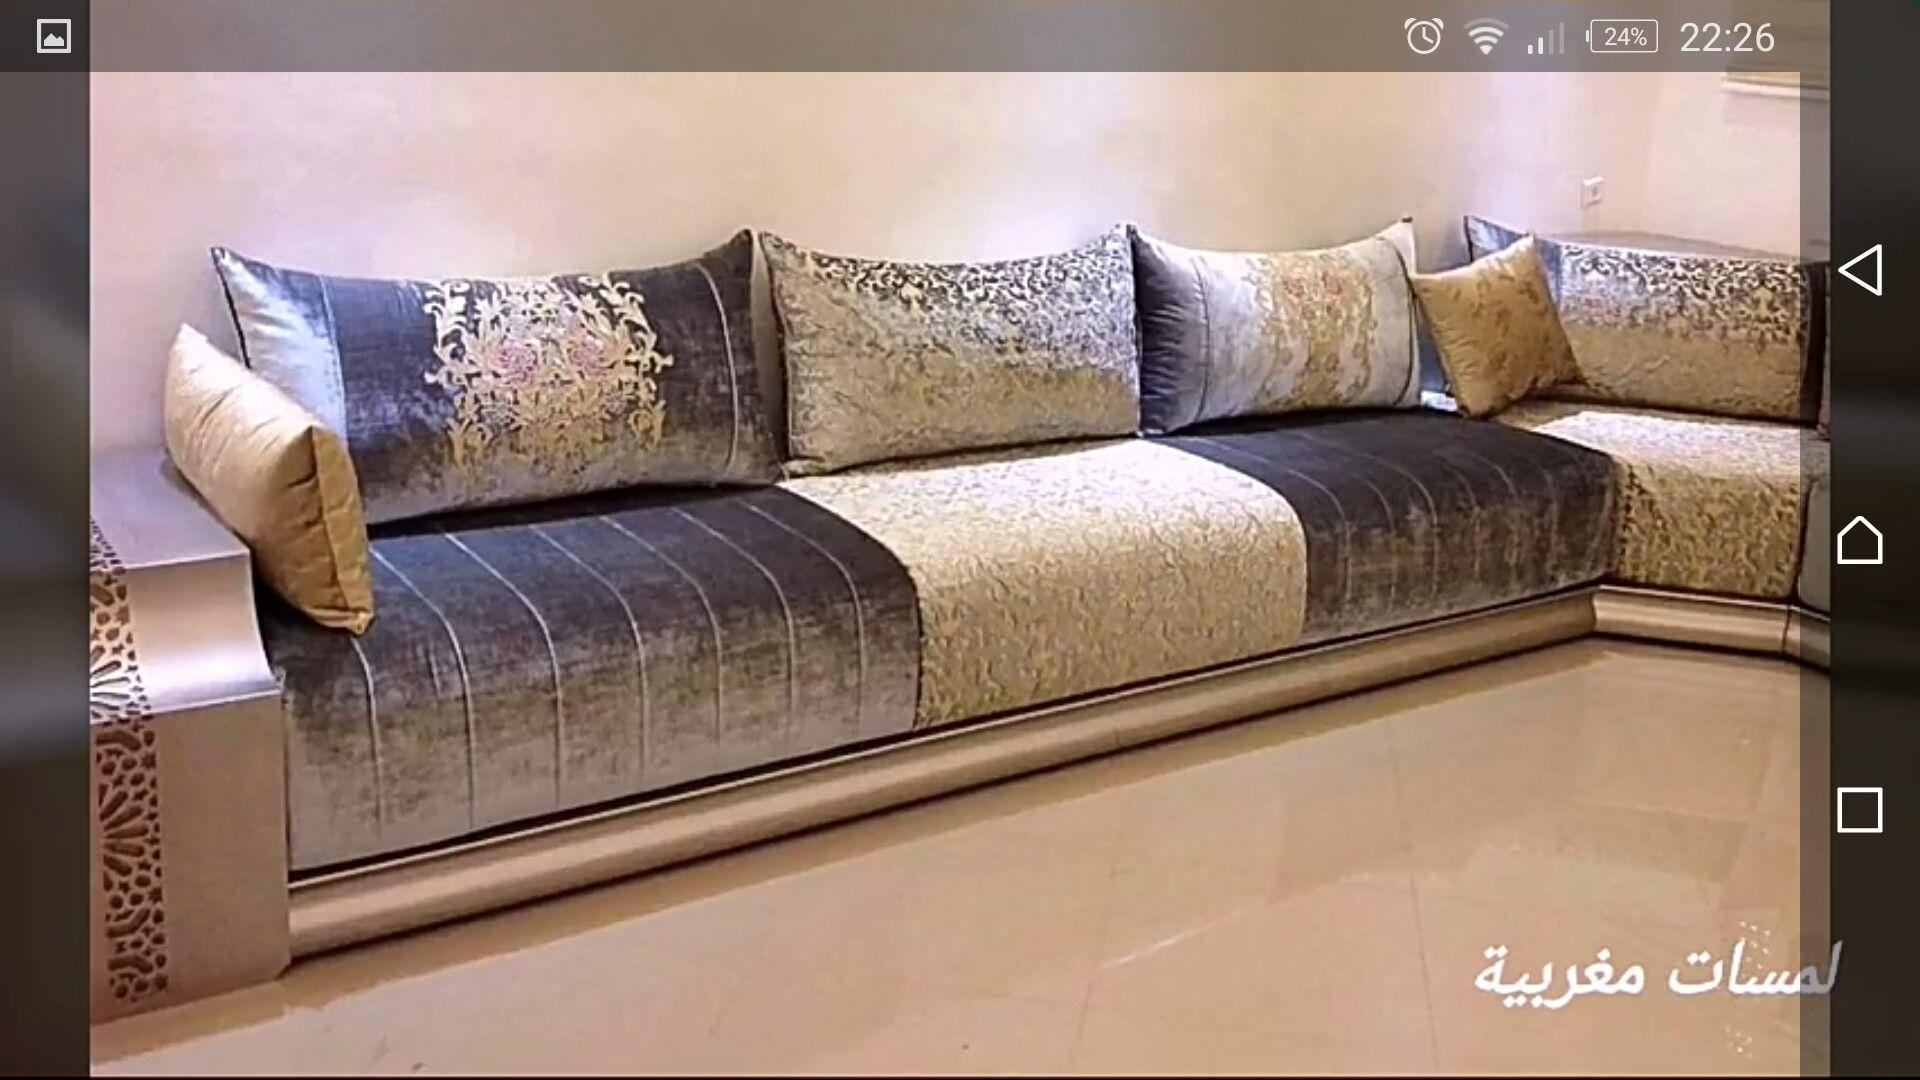 Pin By Benchekroune Nawal On Salon Marocain Home Decor Home Decor Shelves Moroccan Home Decor